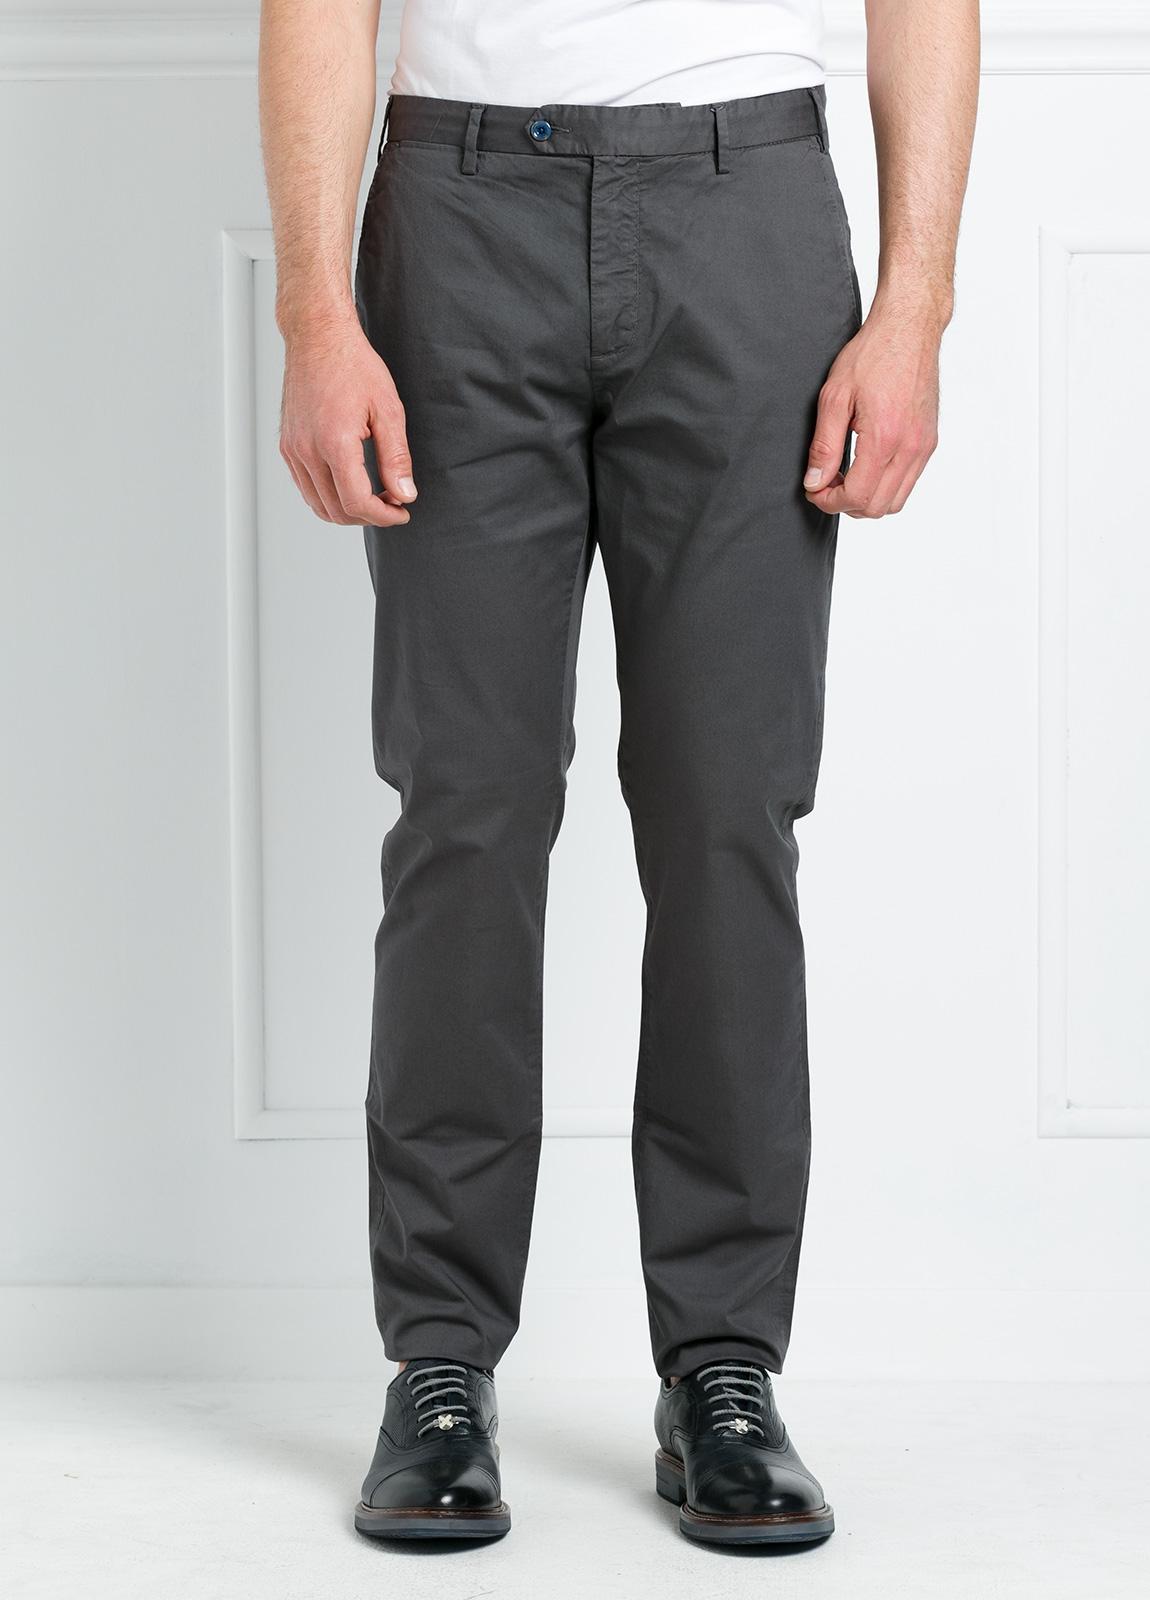 Pantalón chino REGULAR FIT modelo BRIAN color gris oscuro. 97% Algodón gabardina 3% Elastán. - Ítem1